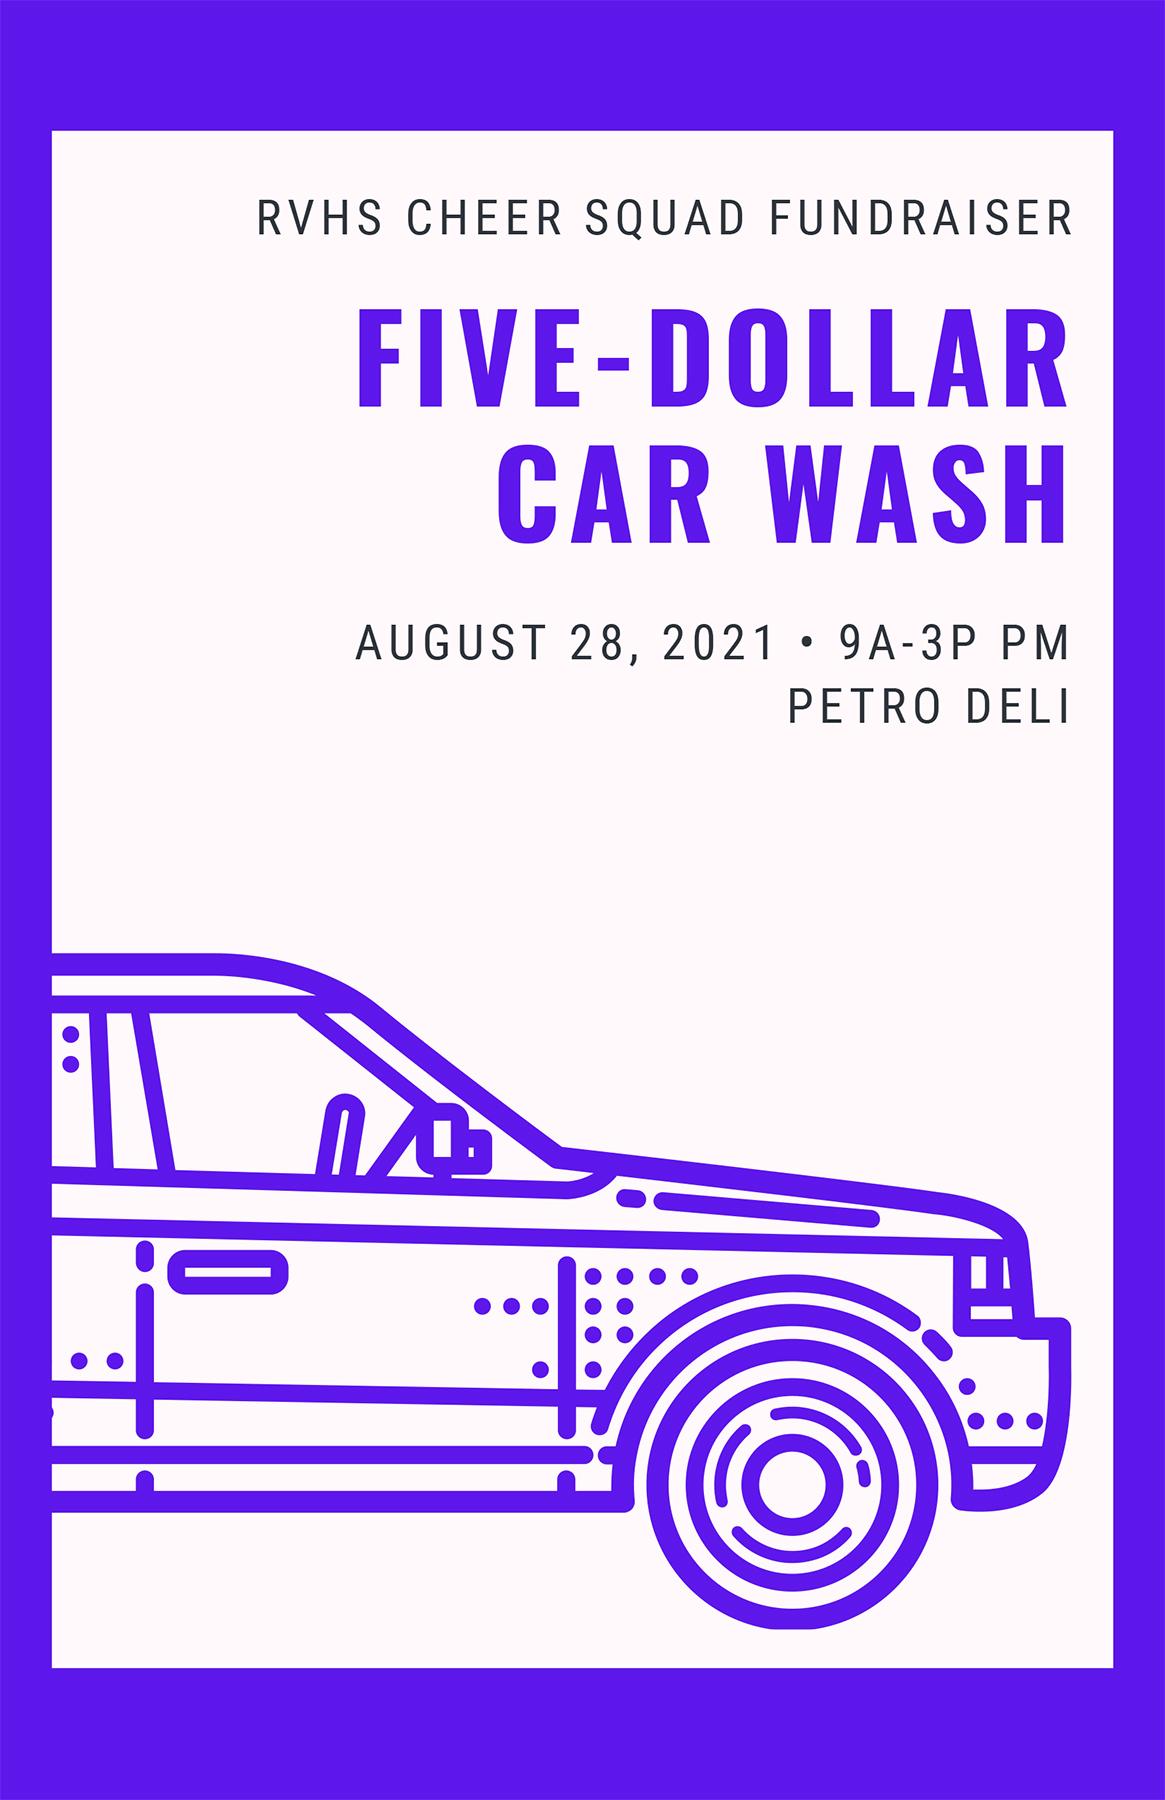 Cheer Car Wash